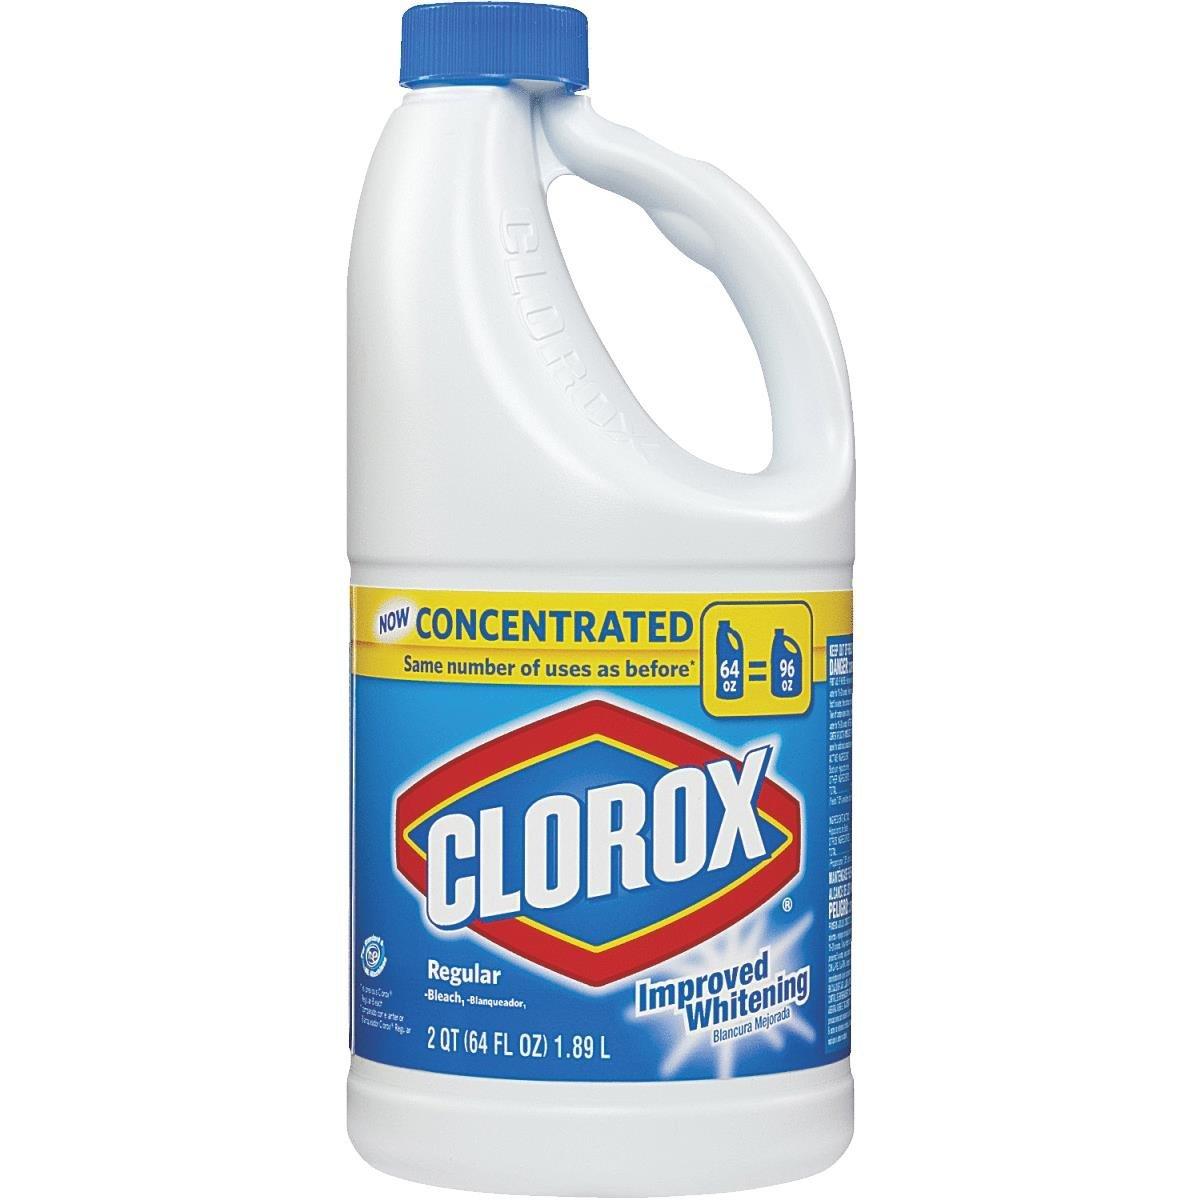 Clorox Regular Concentrated Liquid Bleach